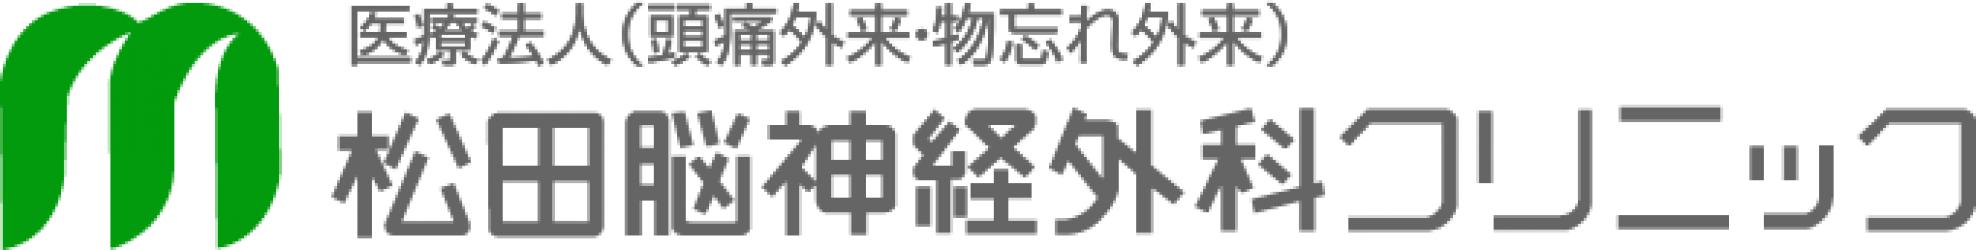 医療法人 松田脳神経外科クリニック | 頭痛外来・物忘れ外来 | 福岡市南区